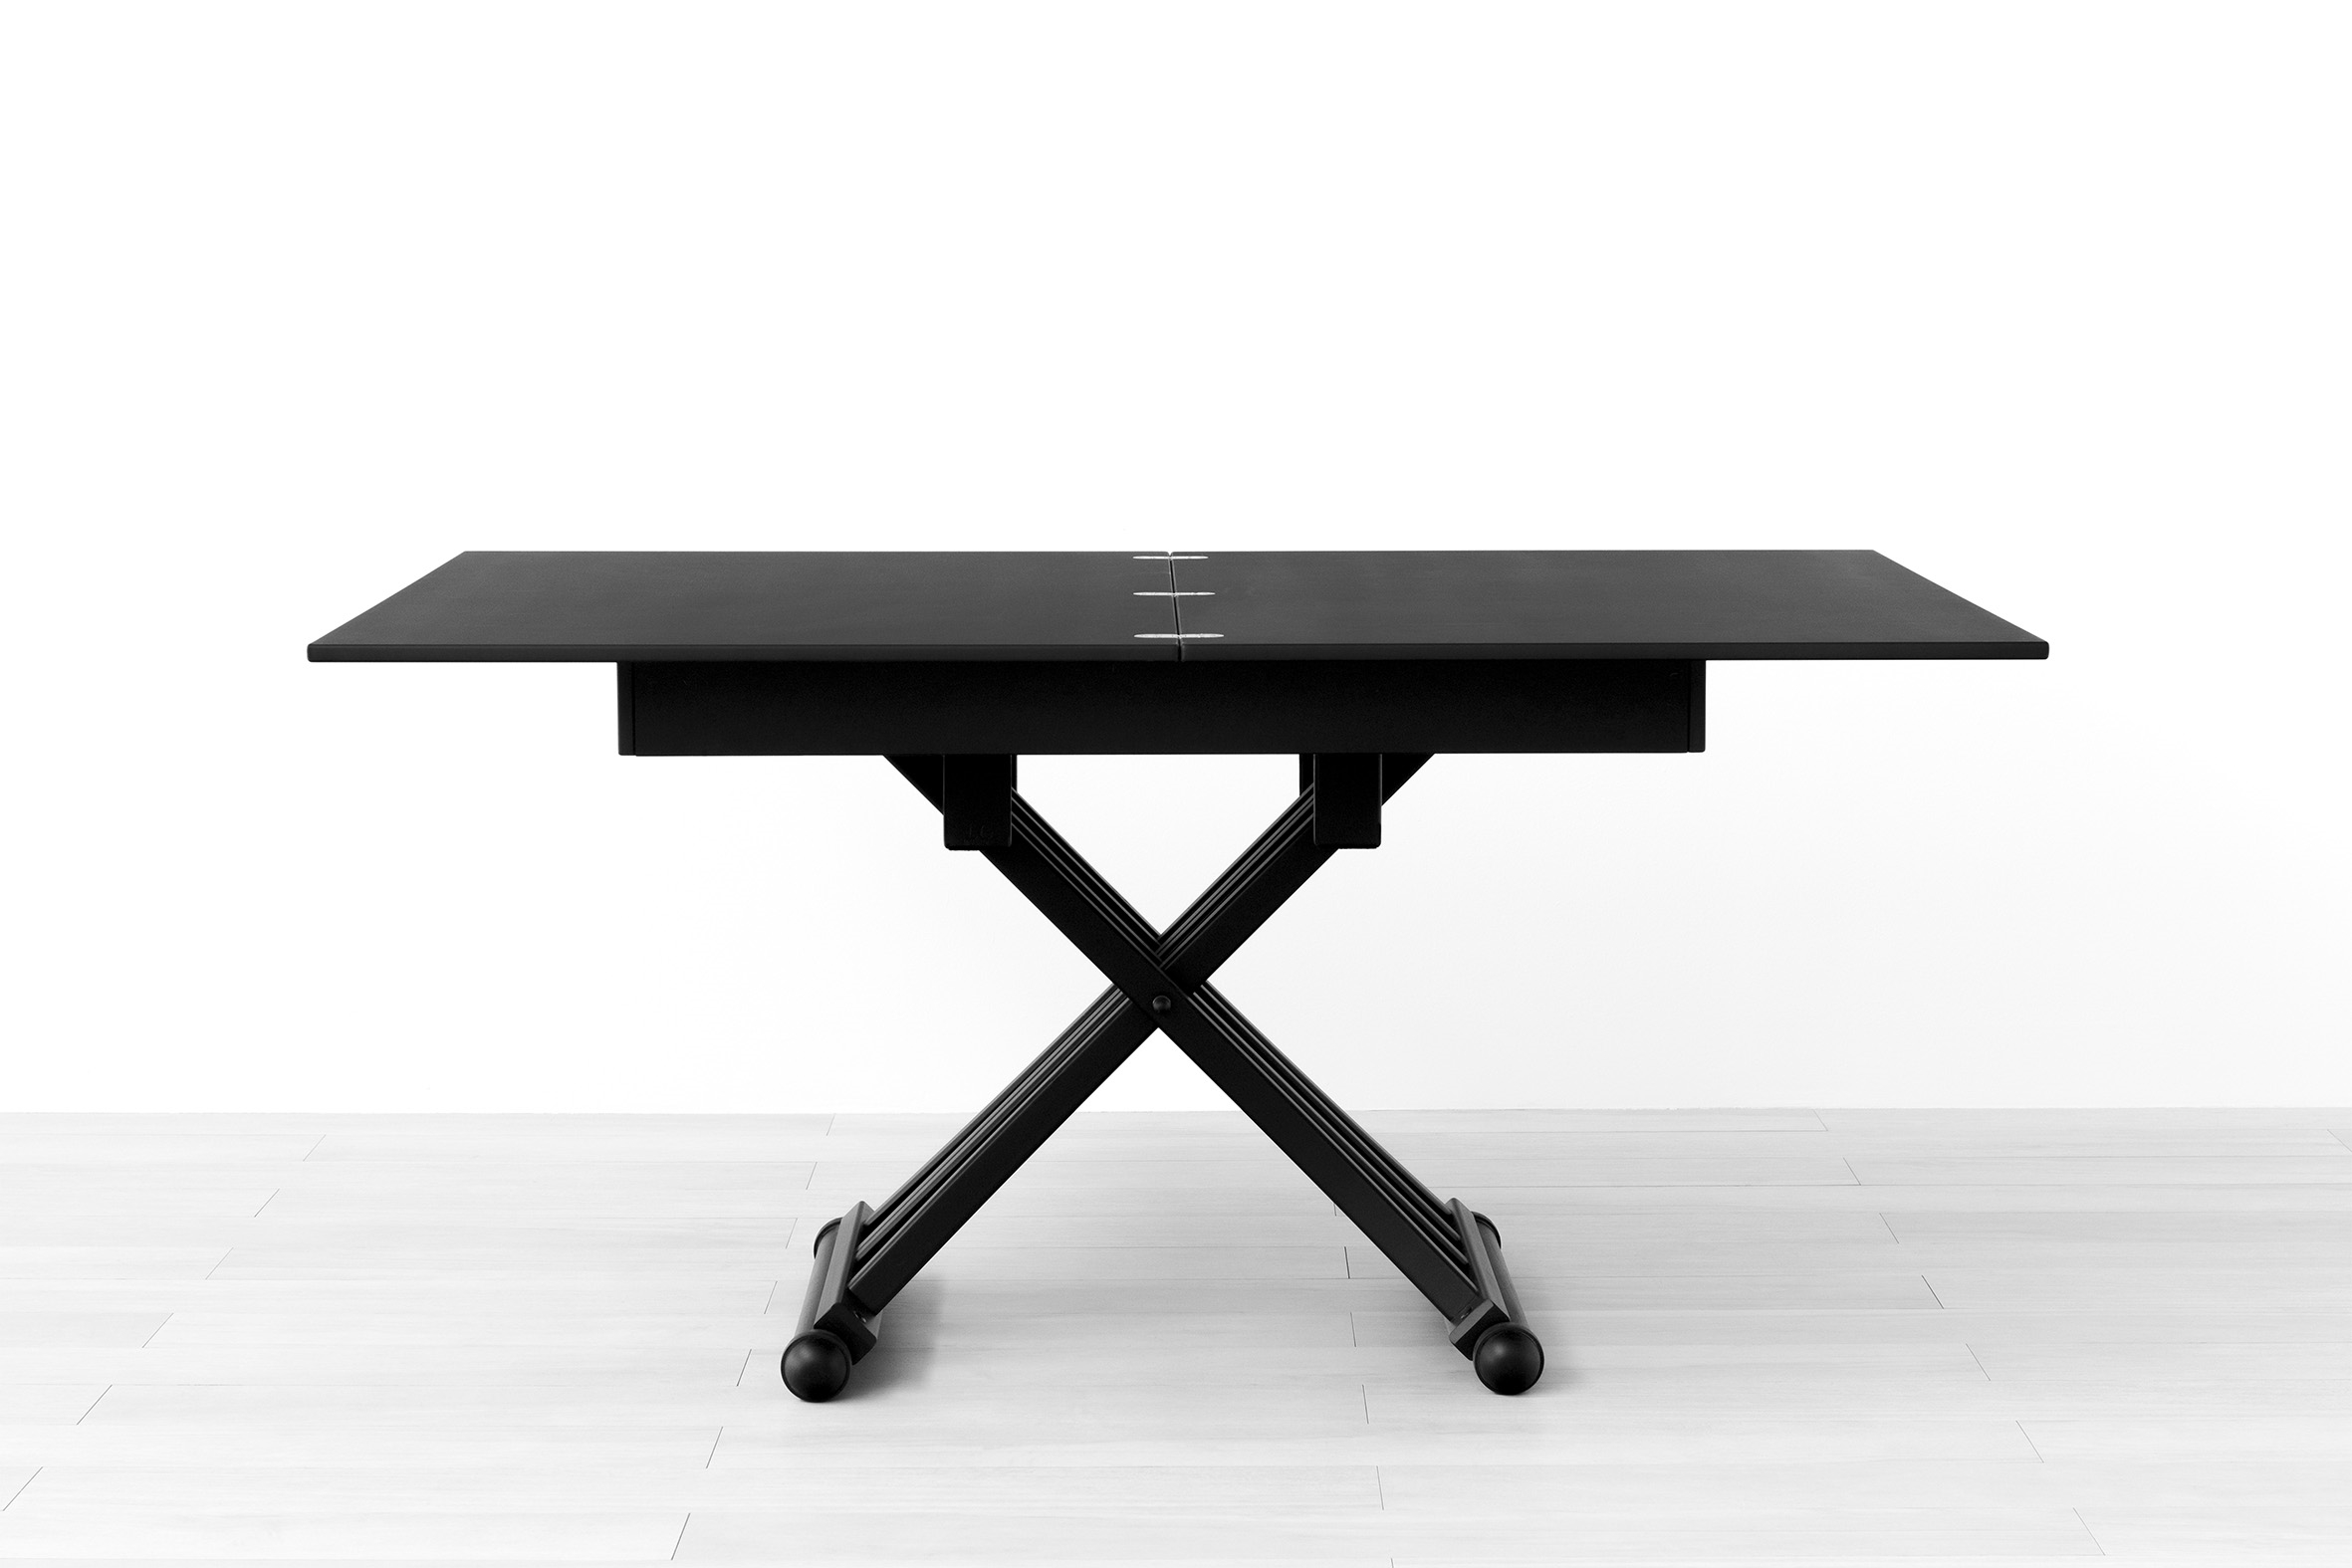 Tavolo salvaspazio 6 8 posti con sconto del 20 tavoli a prezzi scontati - Misure tavolo 6 posti ...